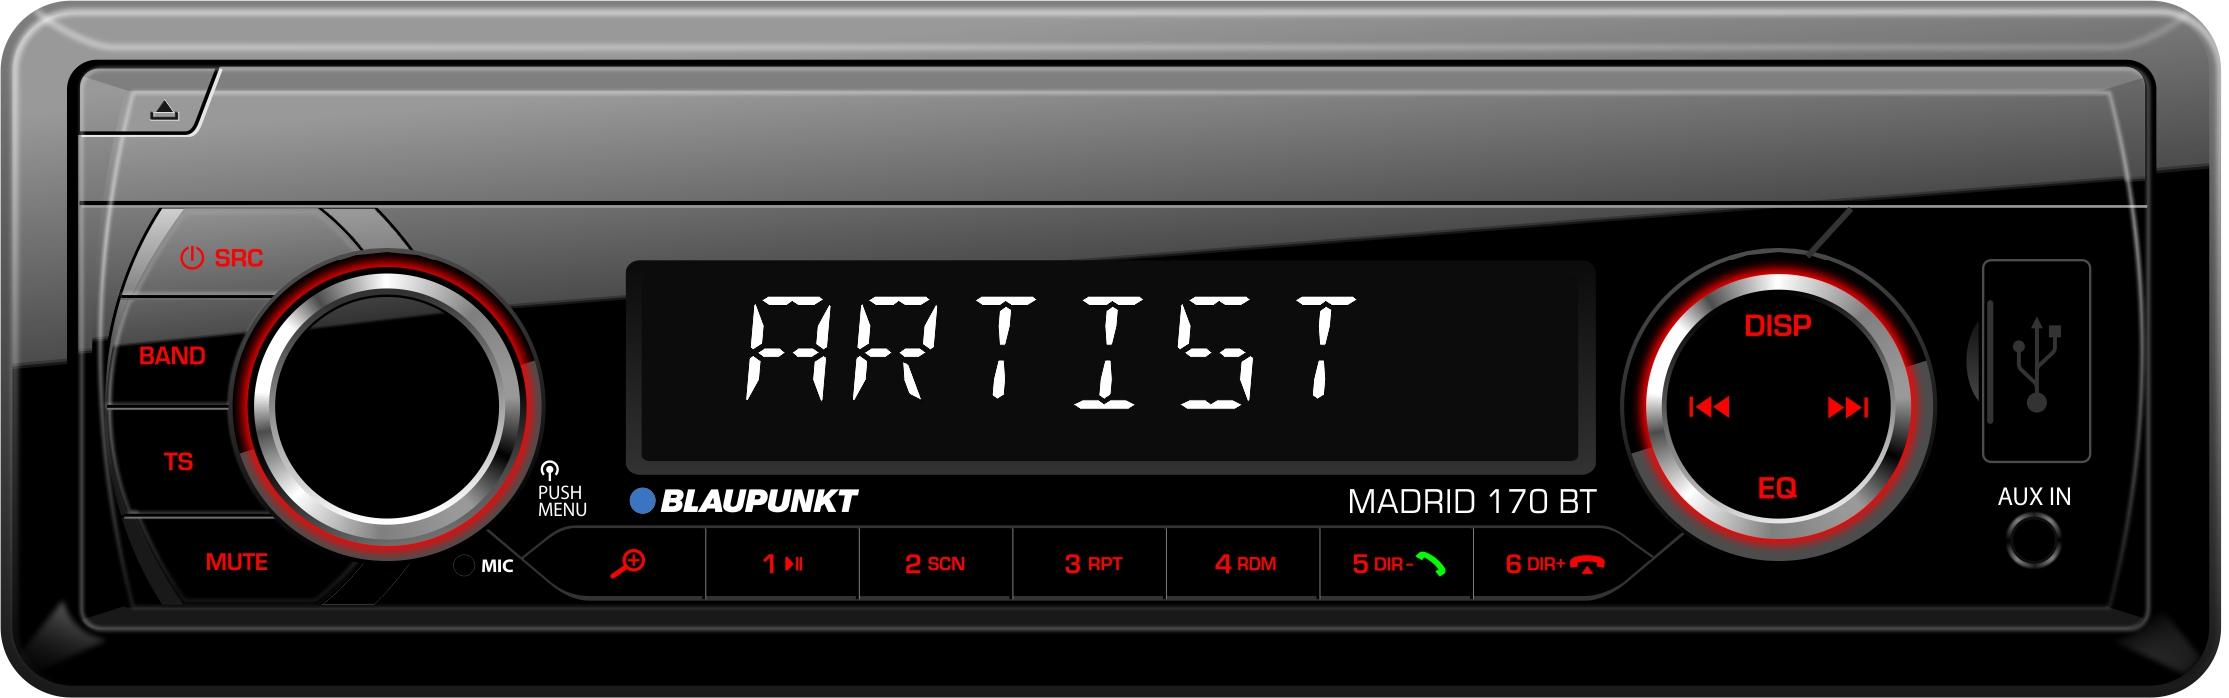 Bilstereo Madrid 170 BT